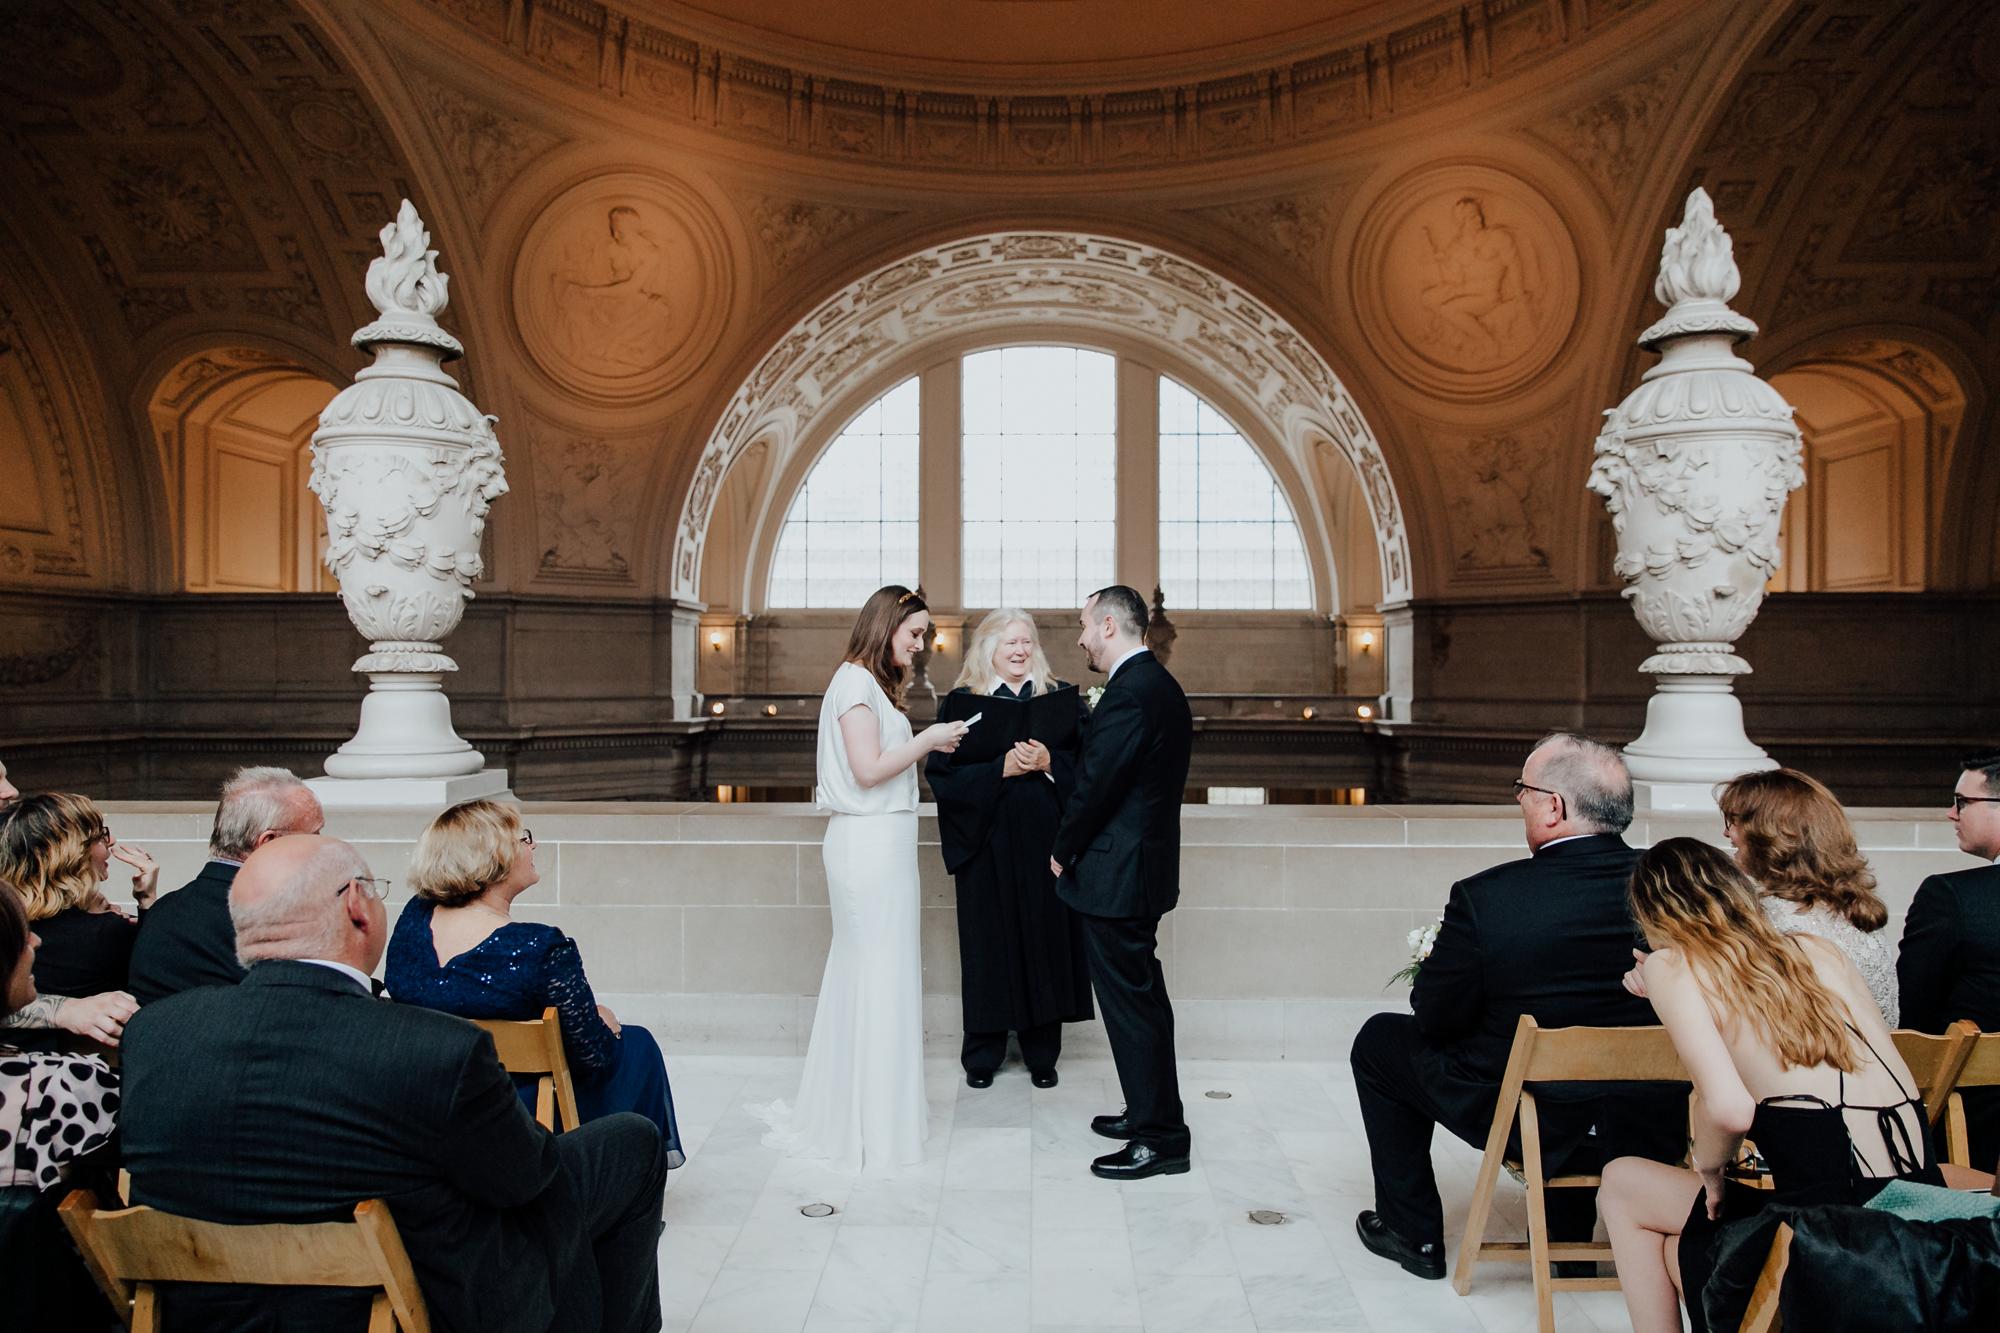 san-francisco-city-hall-wedding-marble-rye-photography-011717.JPG